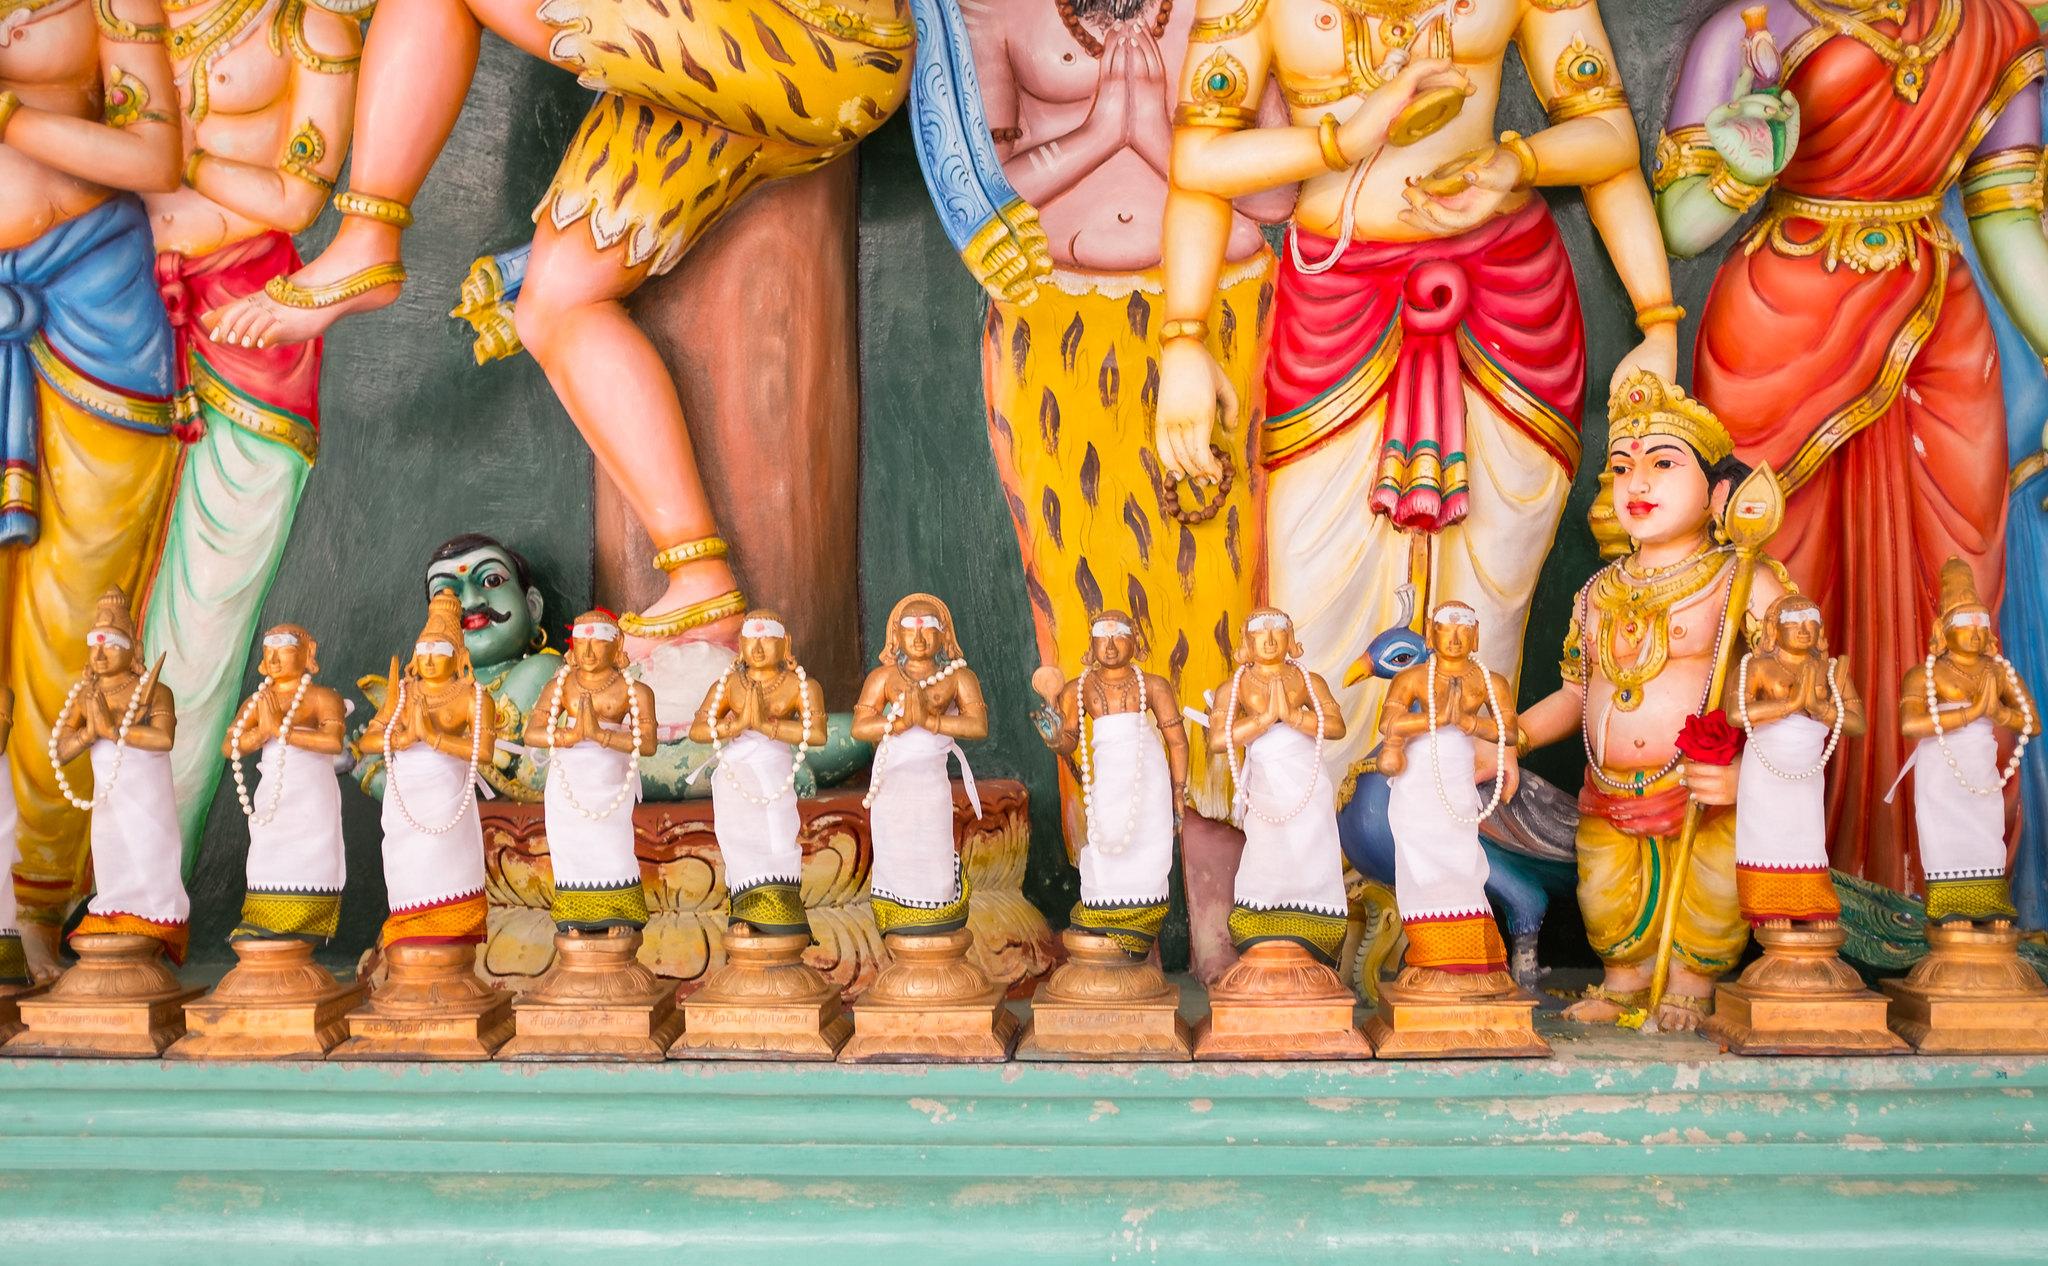 Statues at the Sri Mahamariamman Temple in Kuala Lumpur